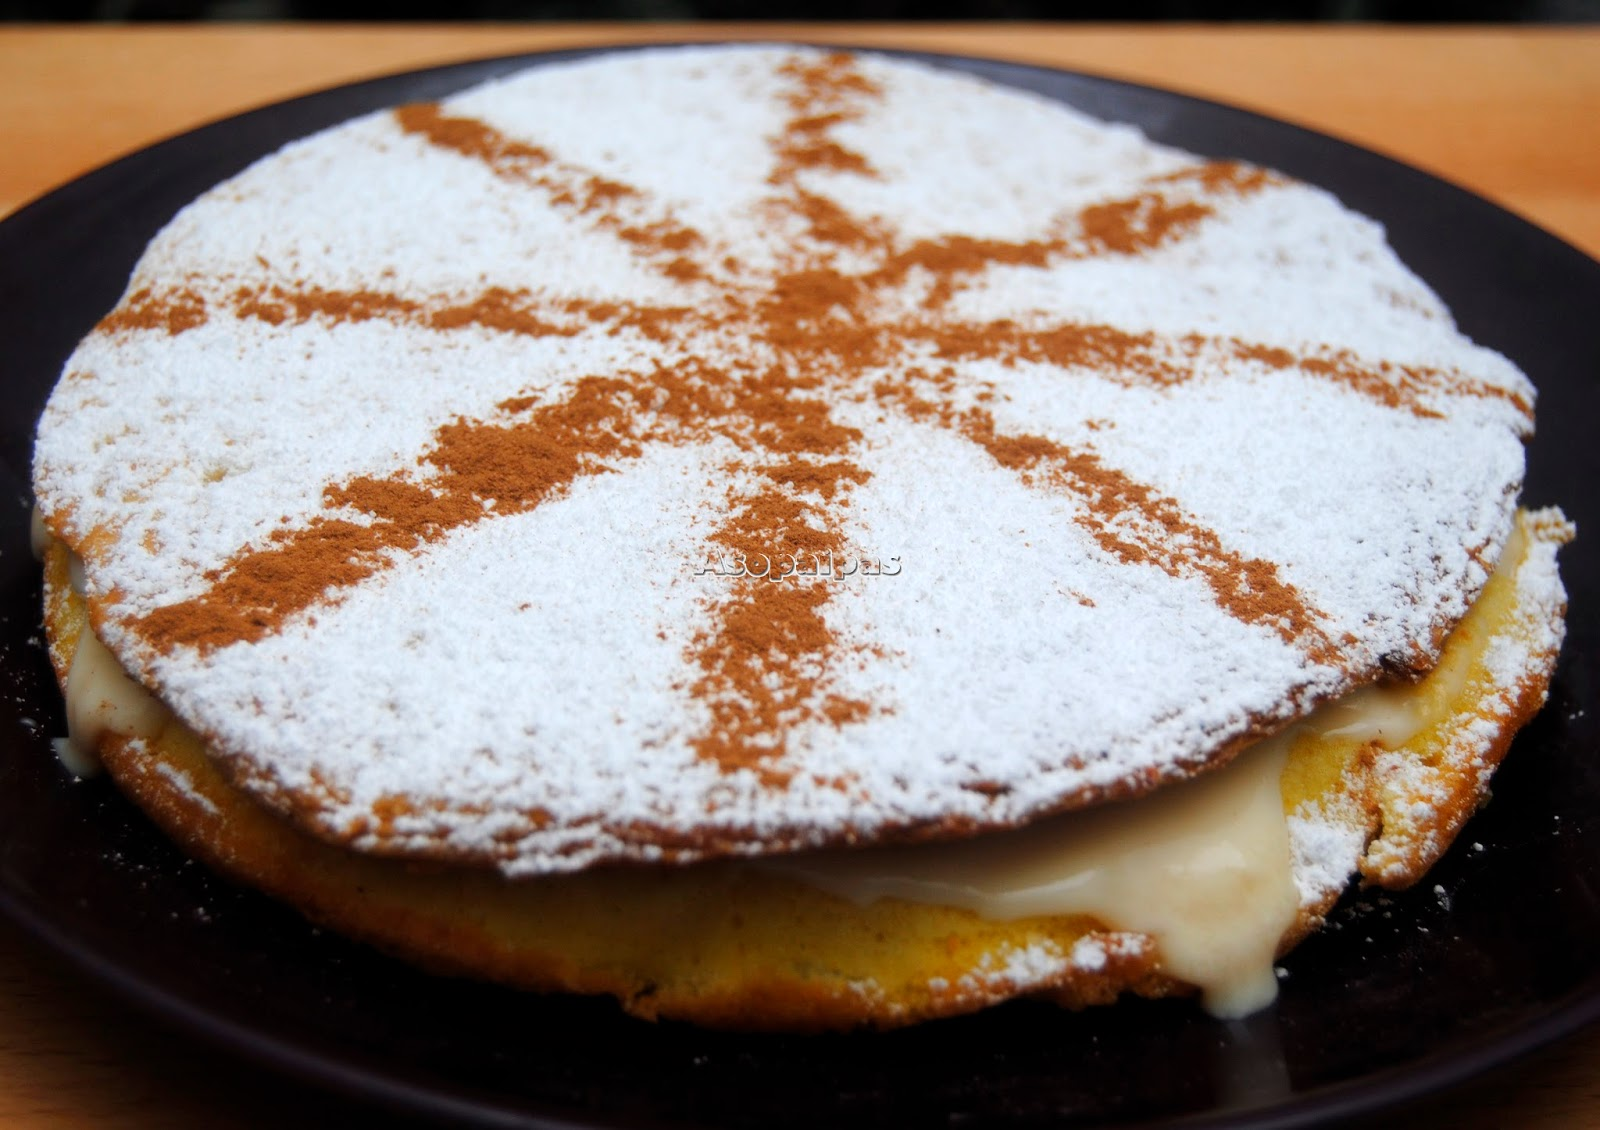 Torta Inglesa con Crema Pastelera